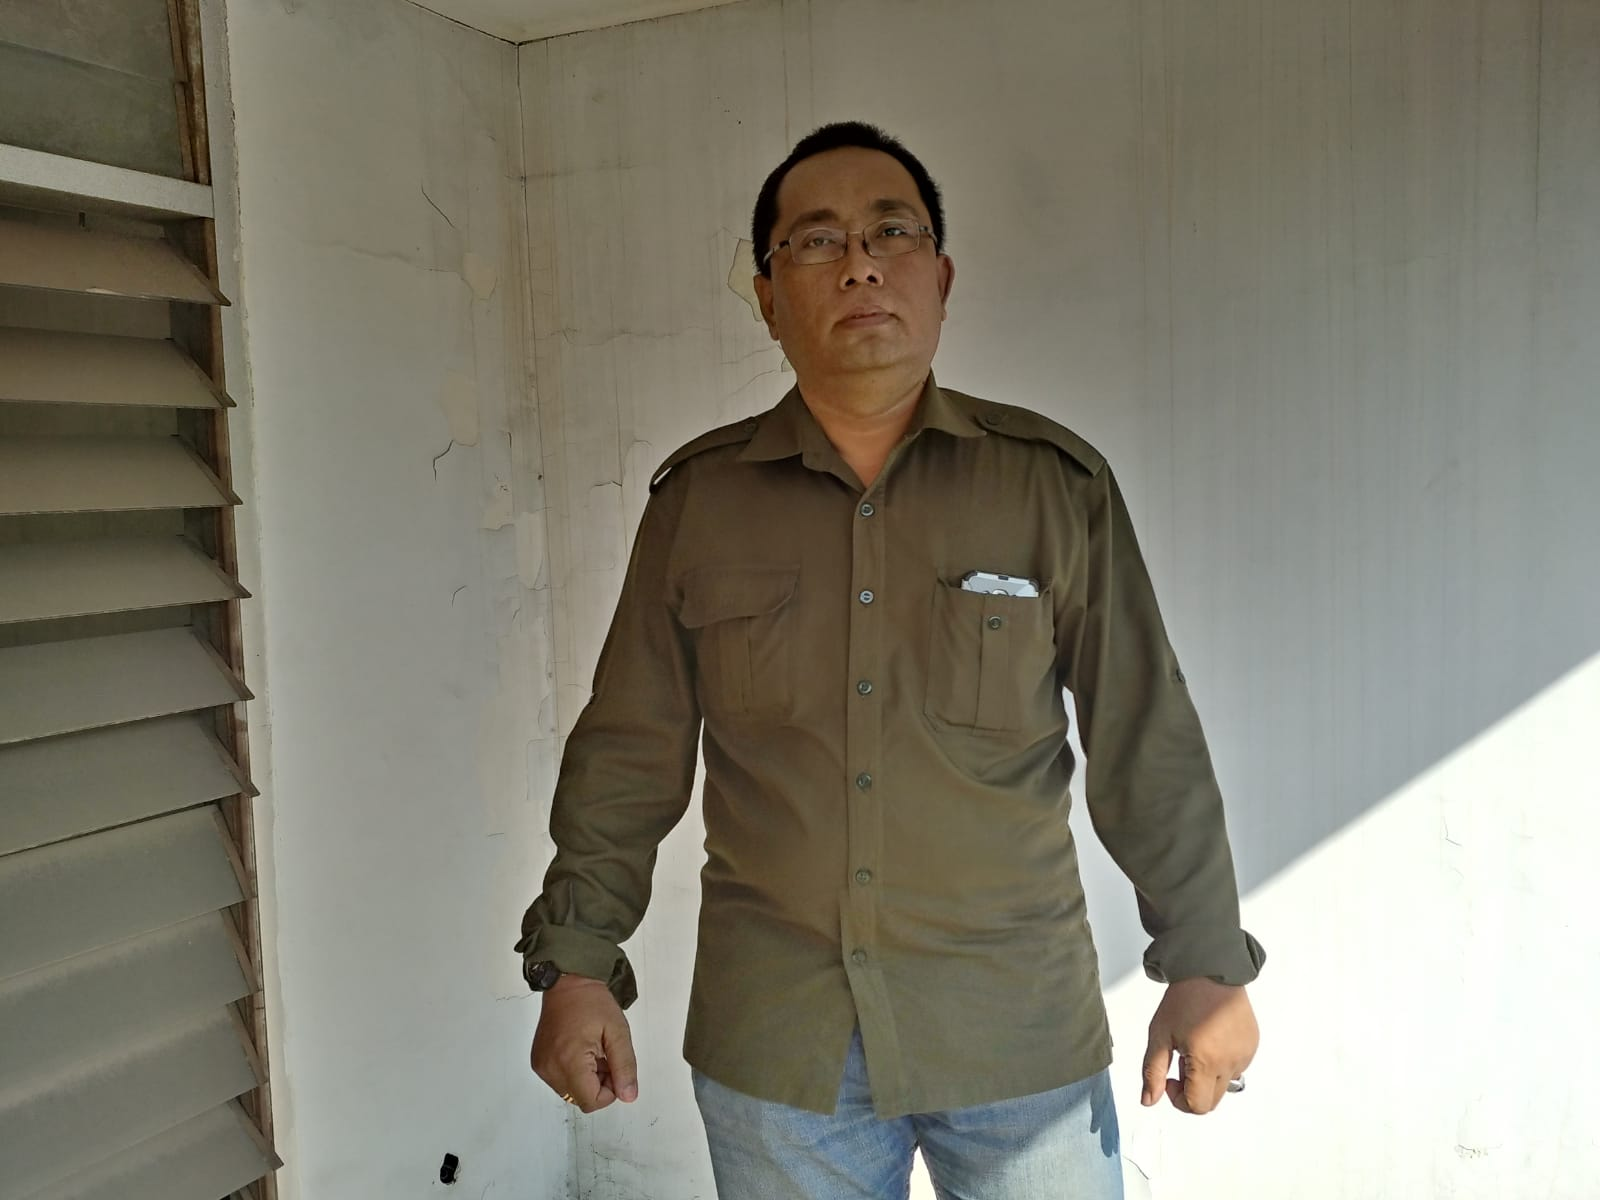 Ketua Pokja JKLPK  Indonesia minta Presien Jokowi Pilih Menteri Kompeten Urusi Masalah Sosial